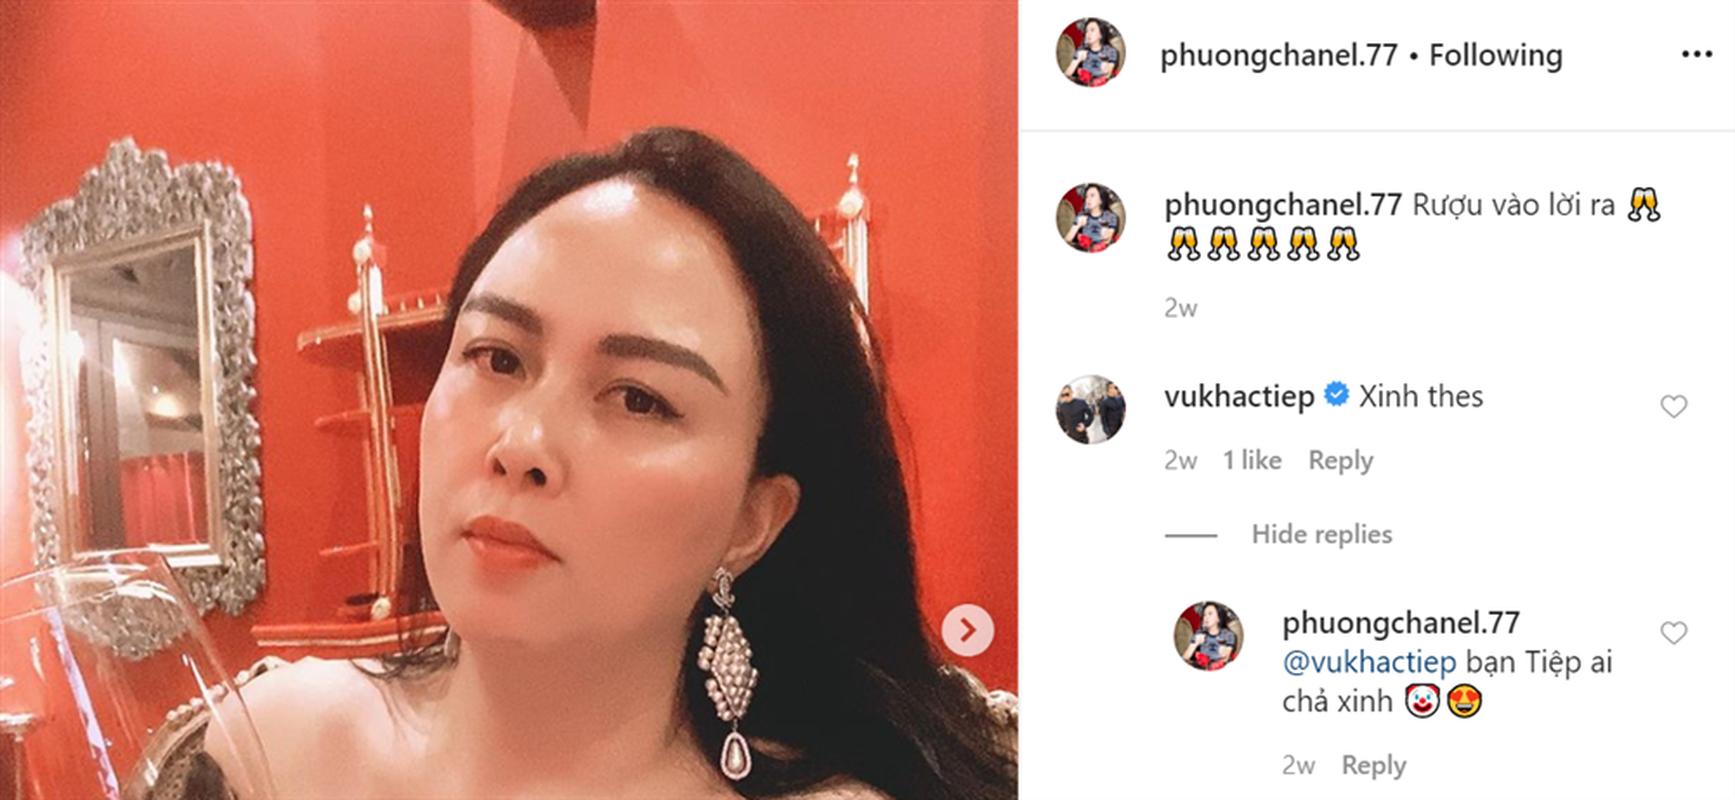 Khen Phuong Chanel